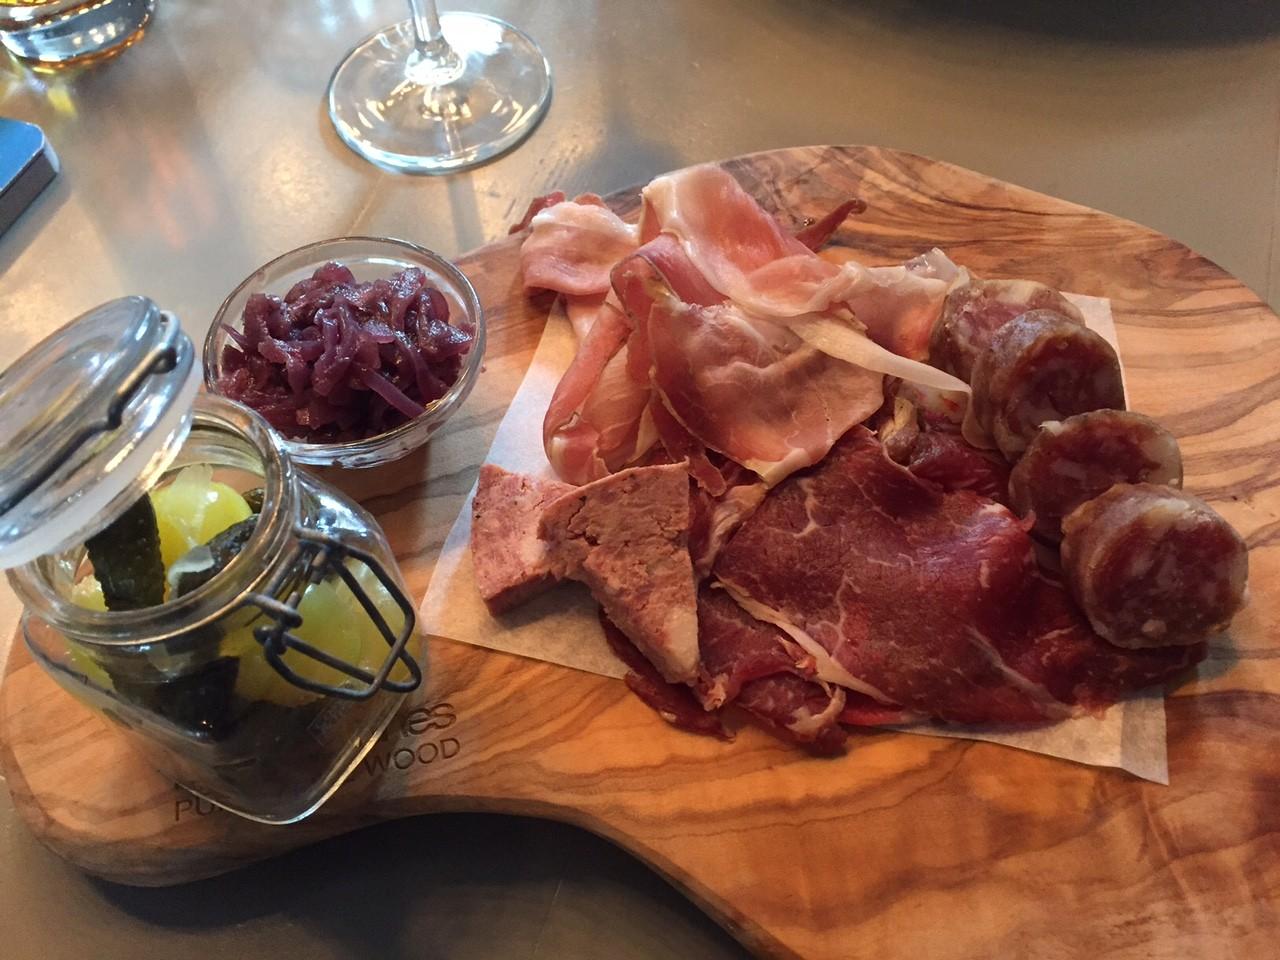 Lunchen bij Restaurant Joost in Amsterdam foodblog Foodinista